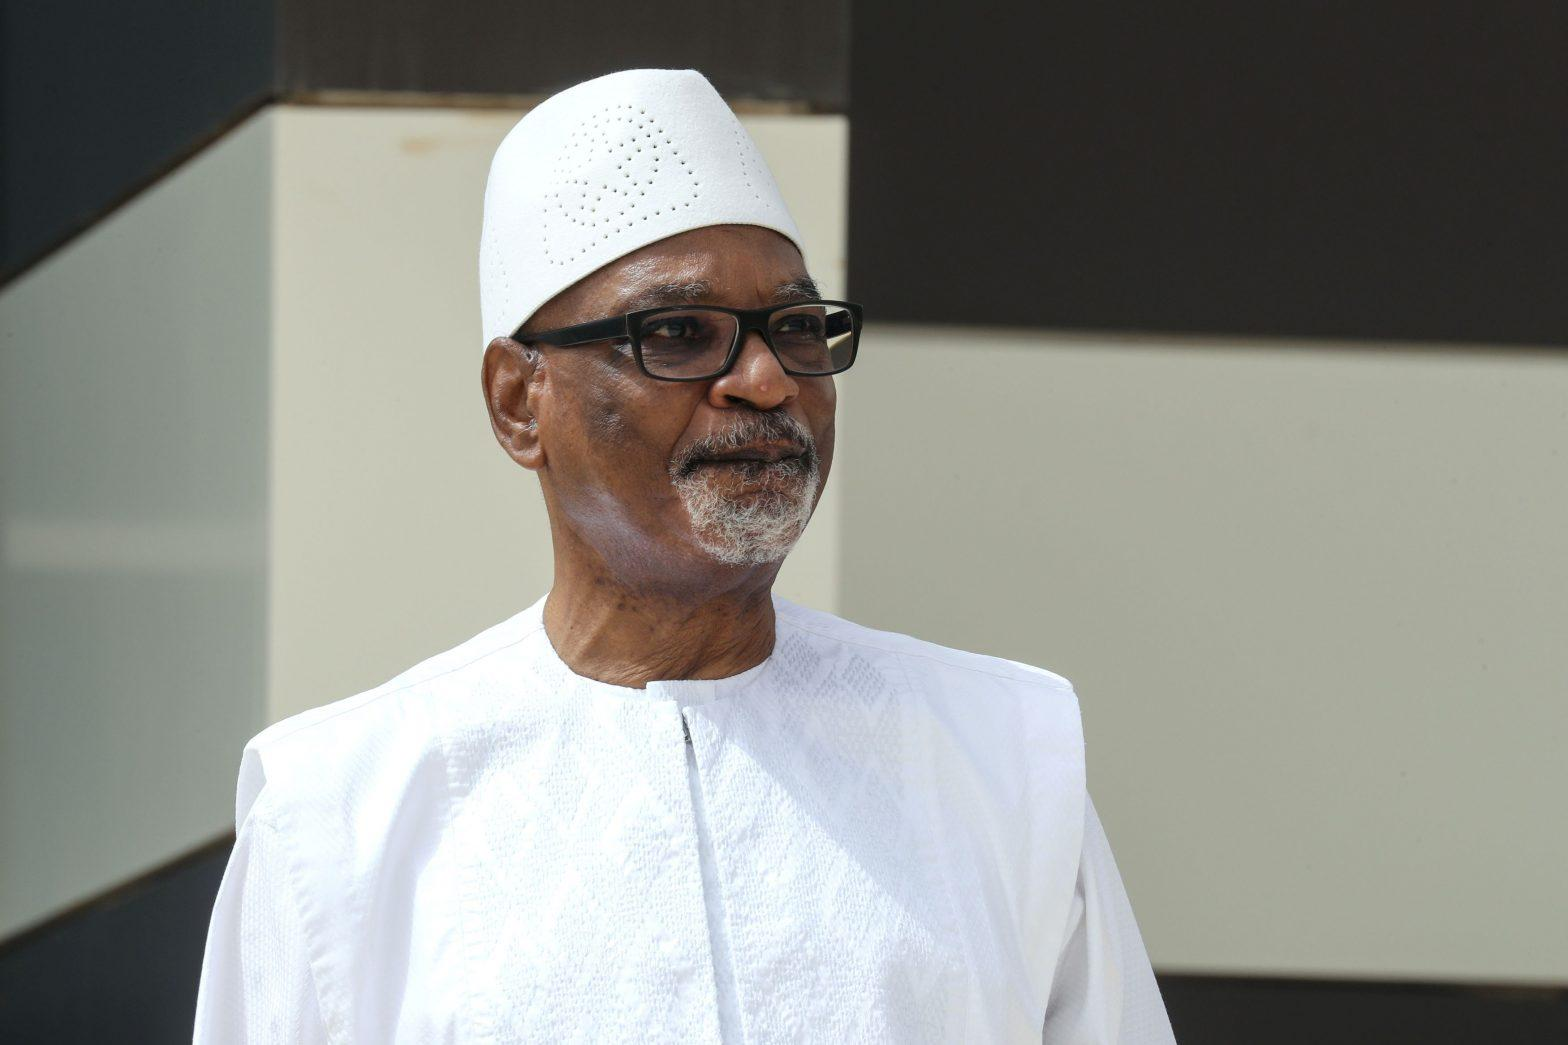 Mali's President Ibrahim Boubacar Keita resigns after military mutiny_40.1